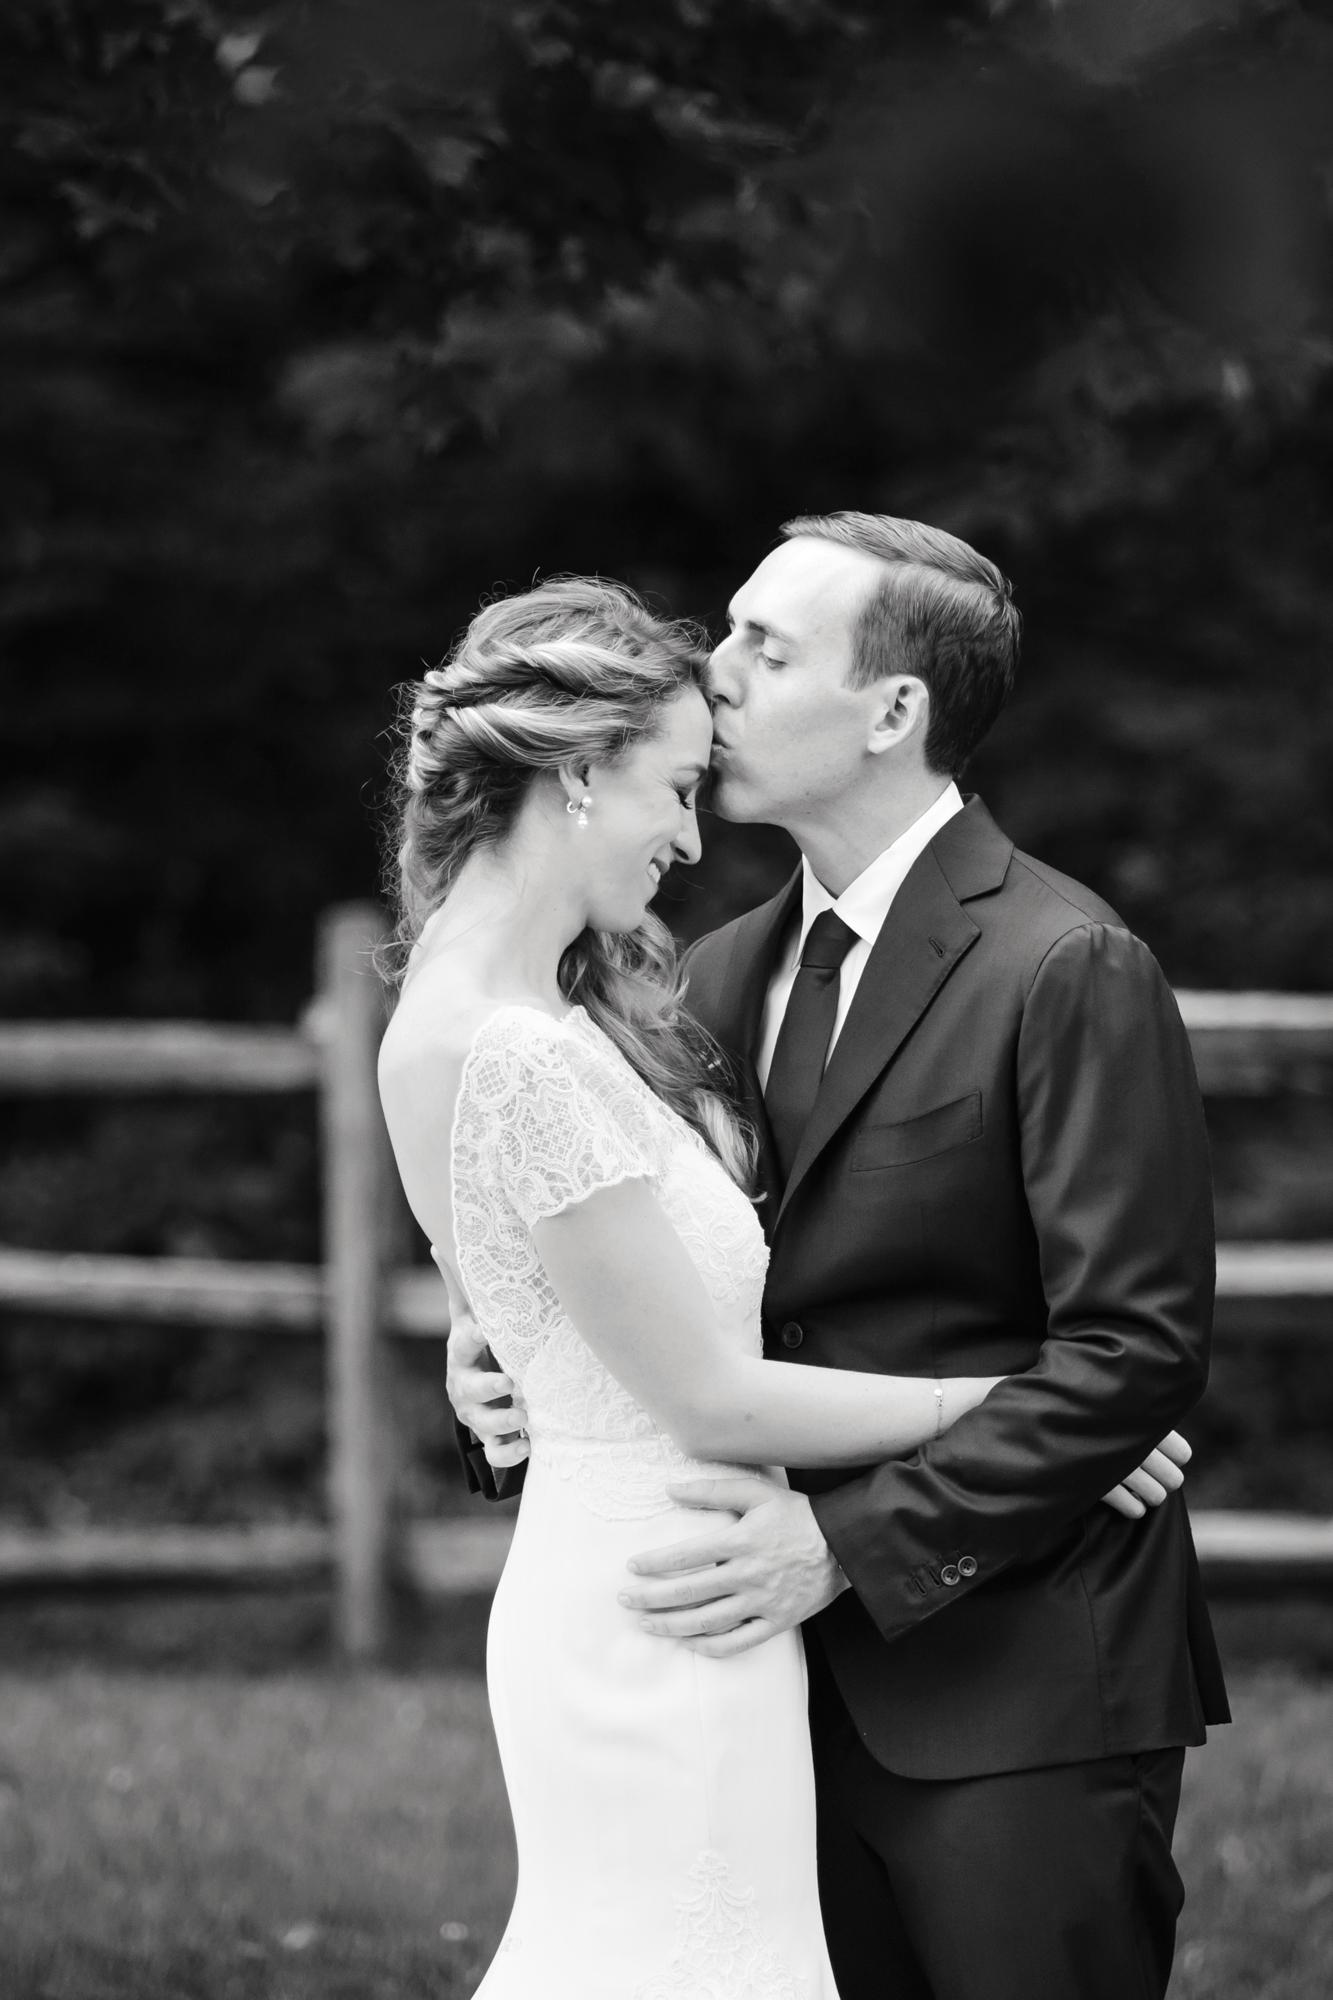 18_Jessica_Ted_Blue_Hill_Stone_Barns_Wedding_Pocantico_NY_Tanya_Salazar_Photography_036.jpg